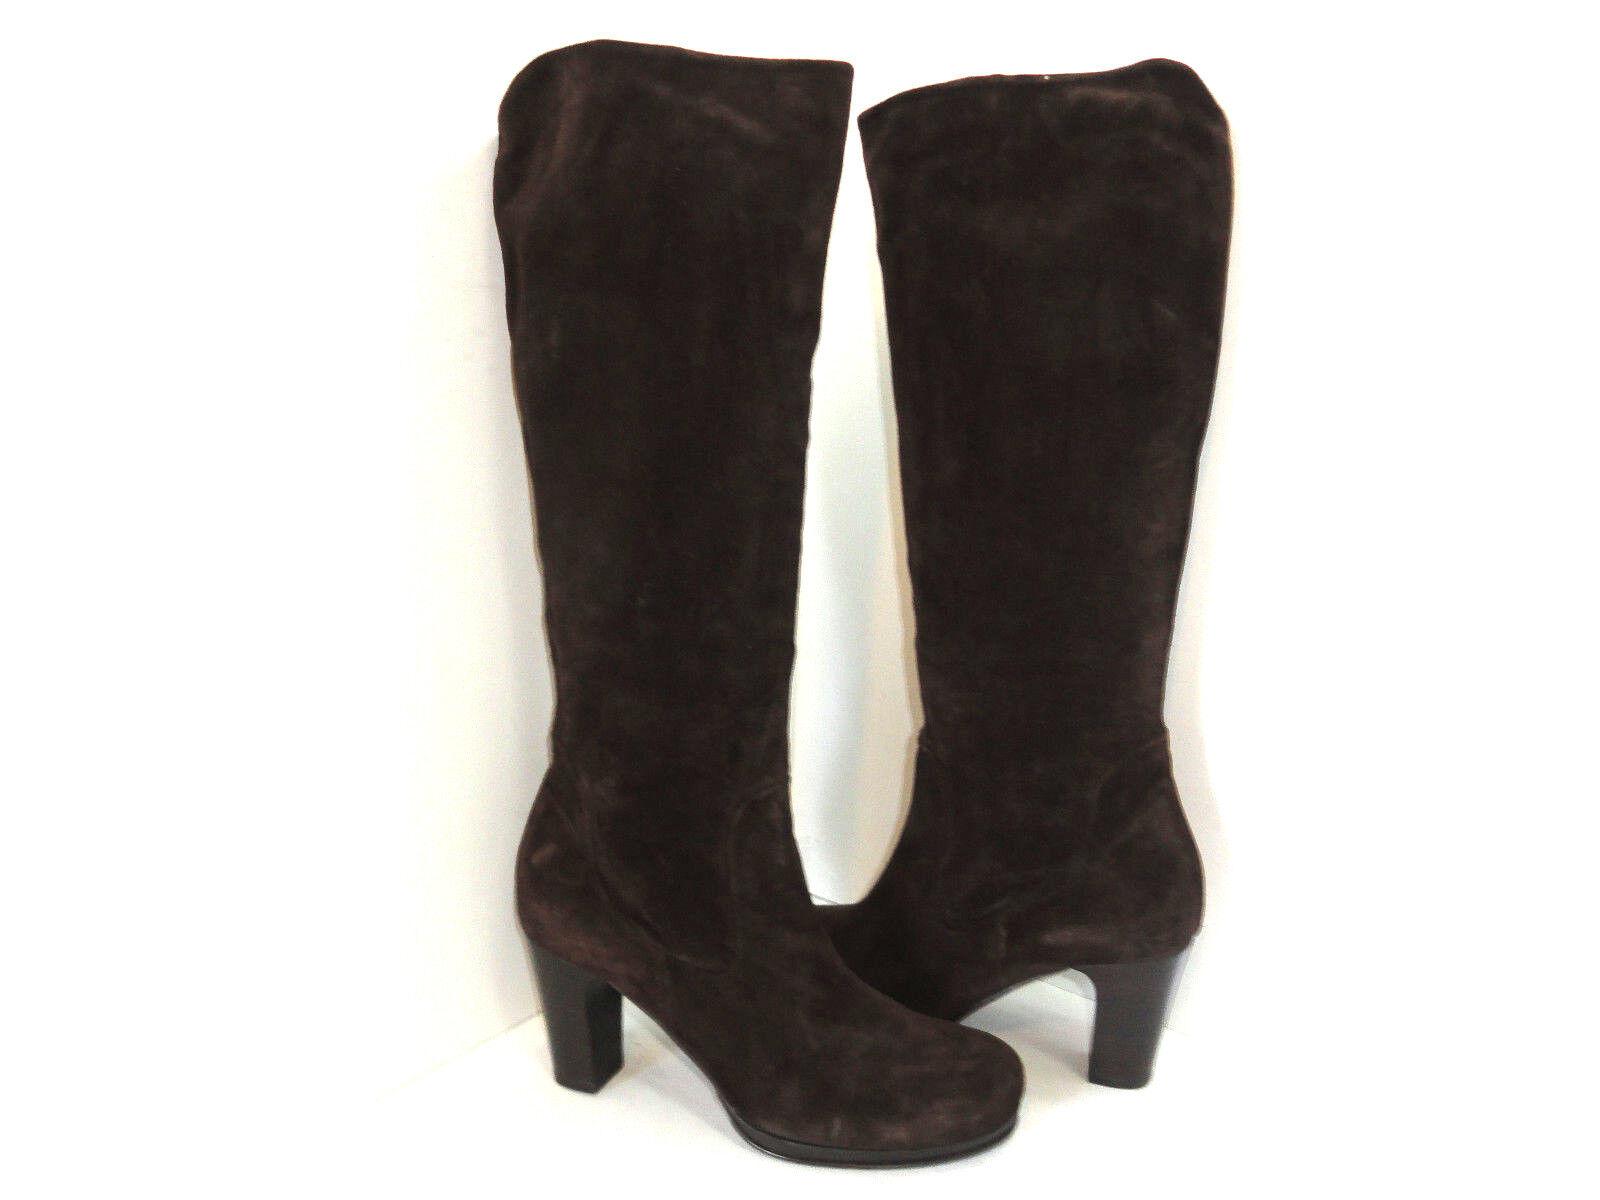 Alberto Fermani Women's Brown Suede Knee High Platform Boots Size 9 US 40EU